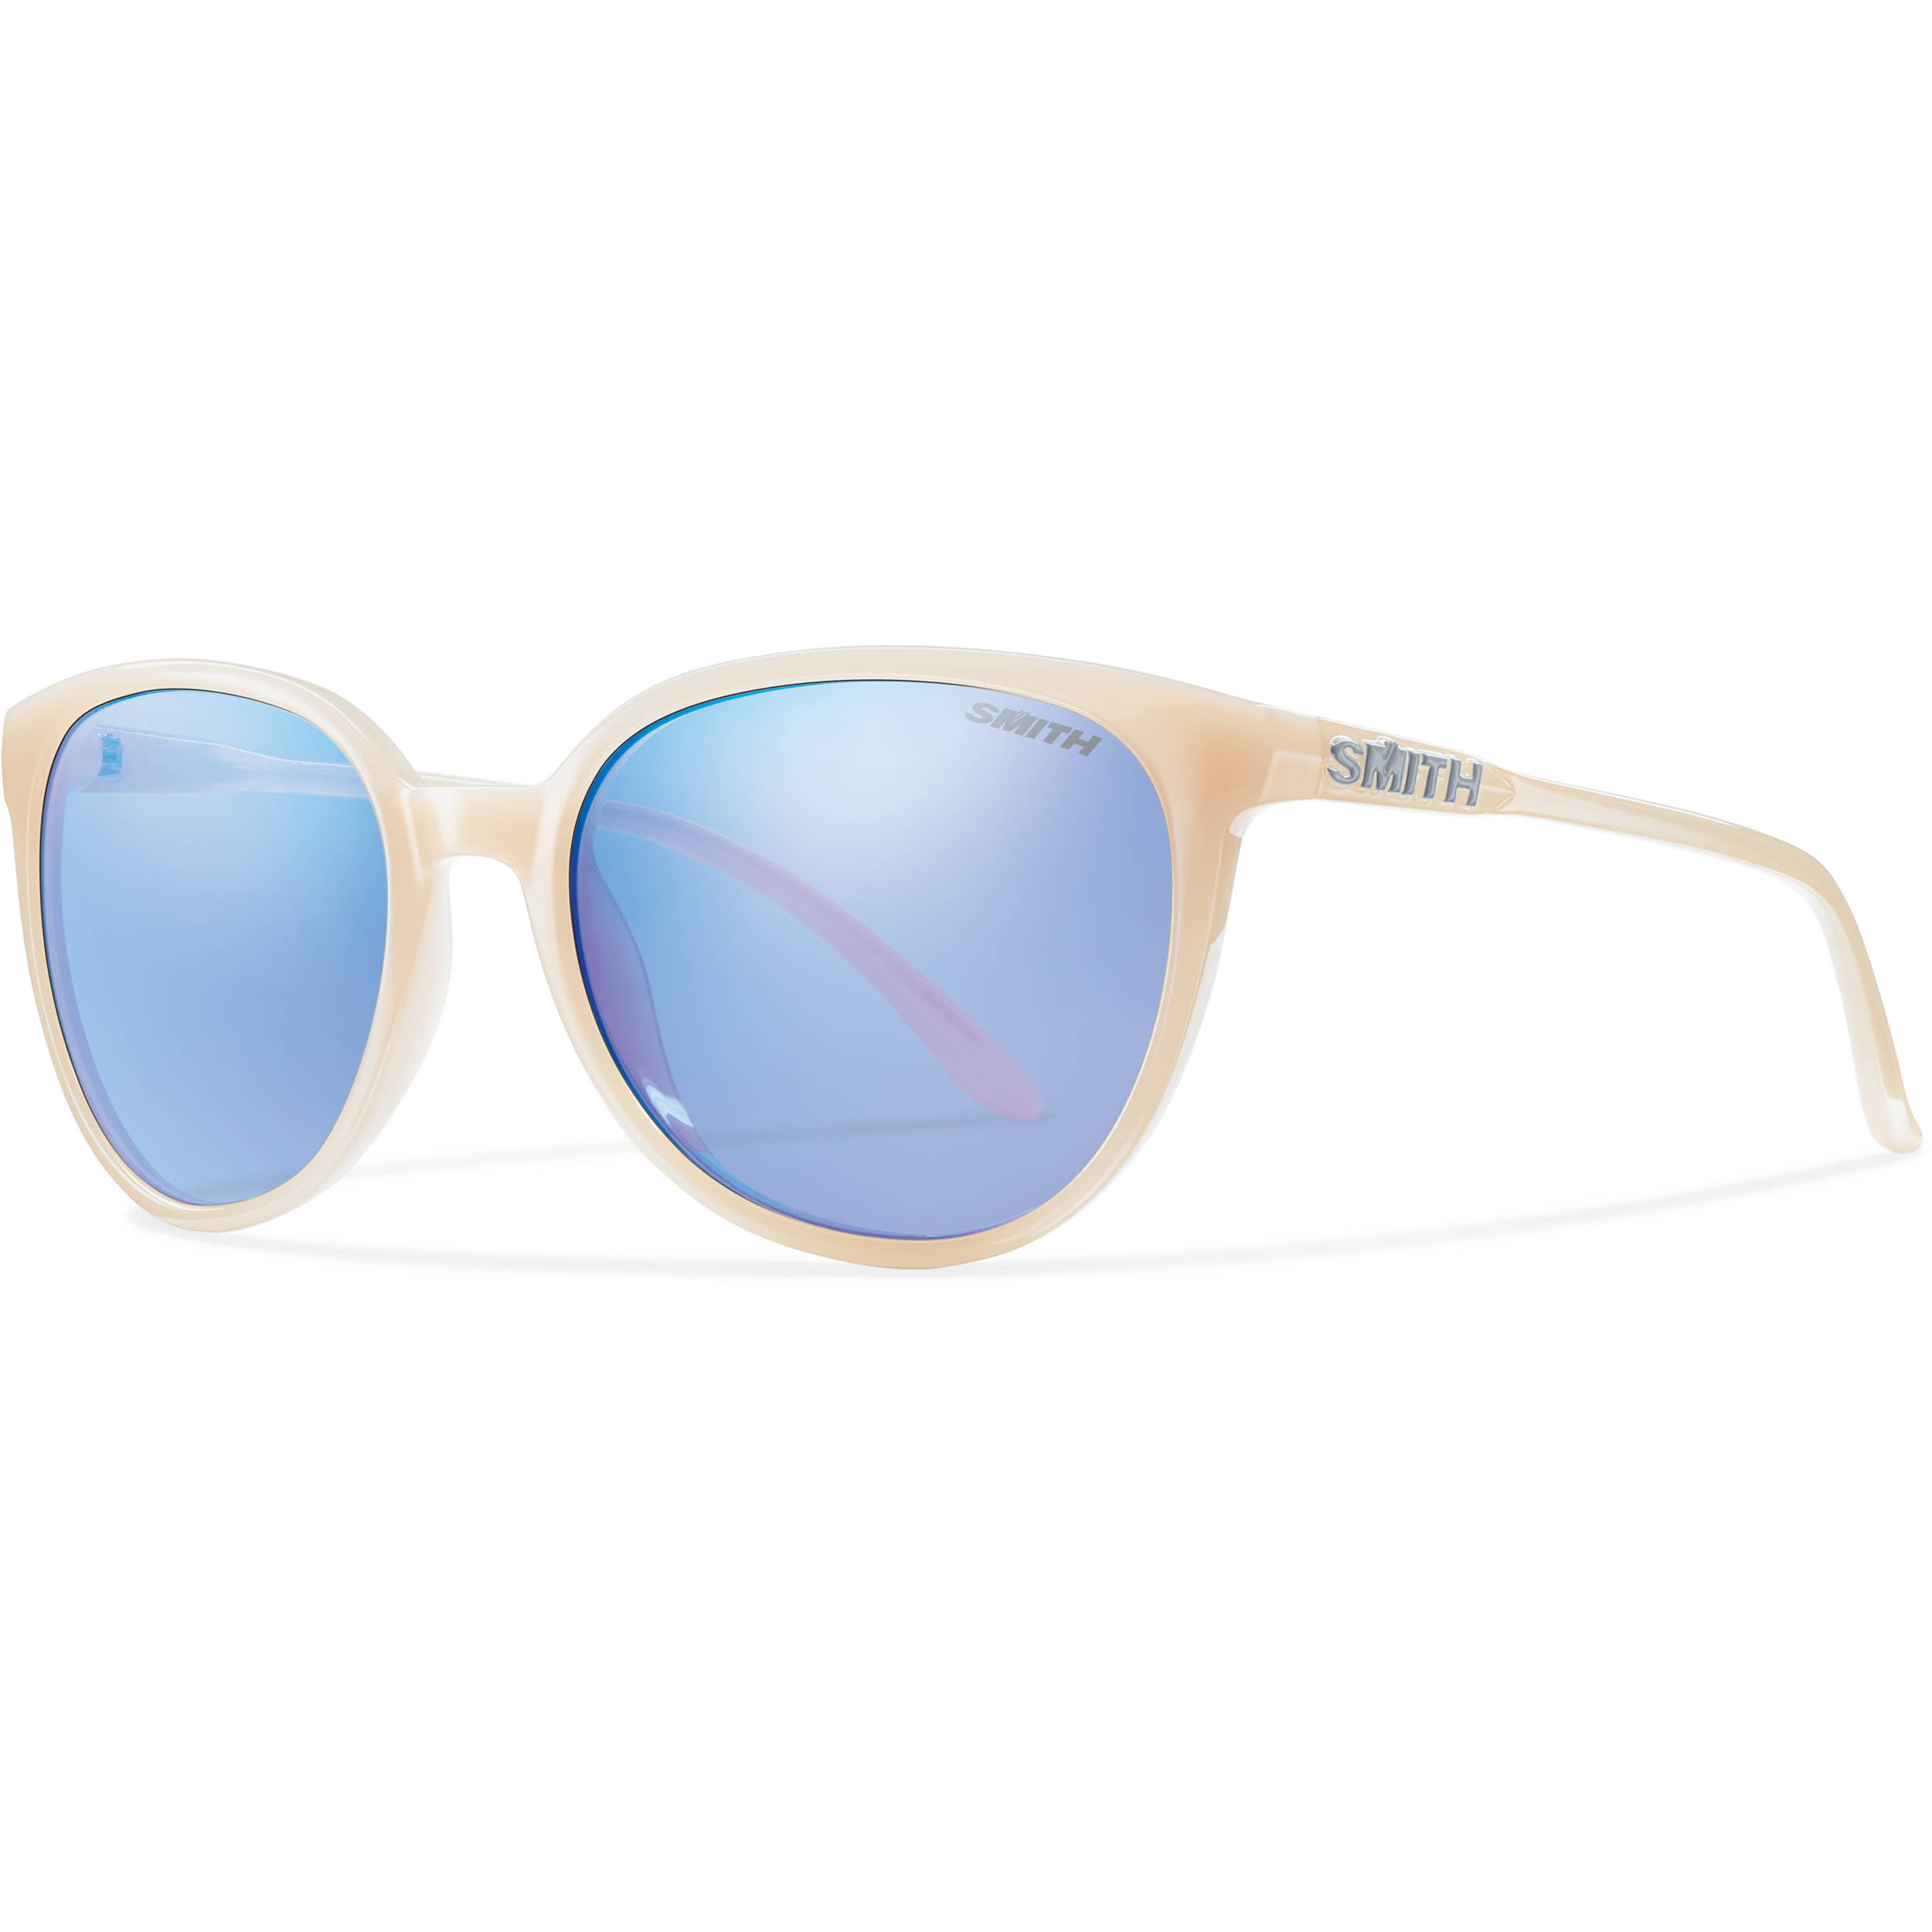 369d97b6b15 Smith Optics Cheetah Women s Sunglasses with Blue Flash Mirror Lenses (Nude  Frames)